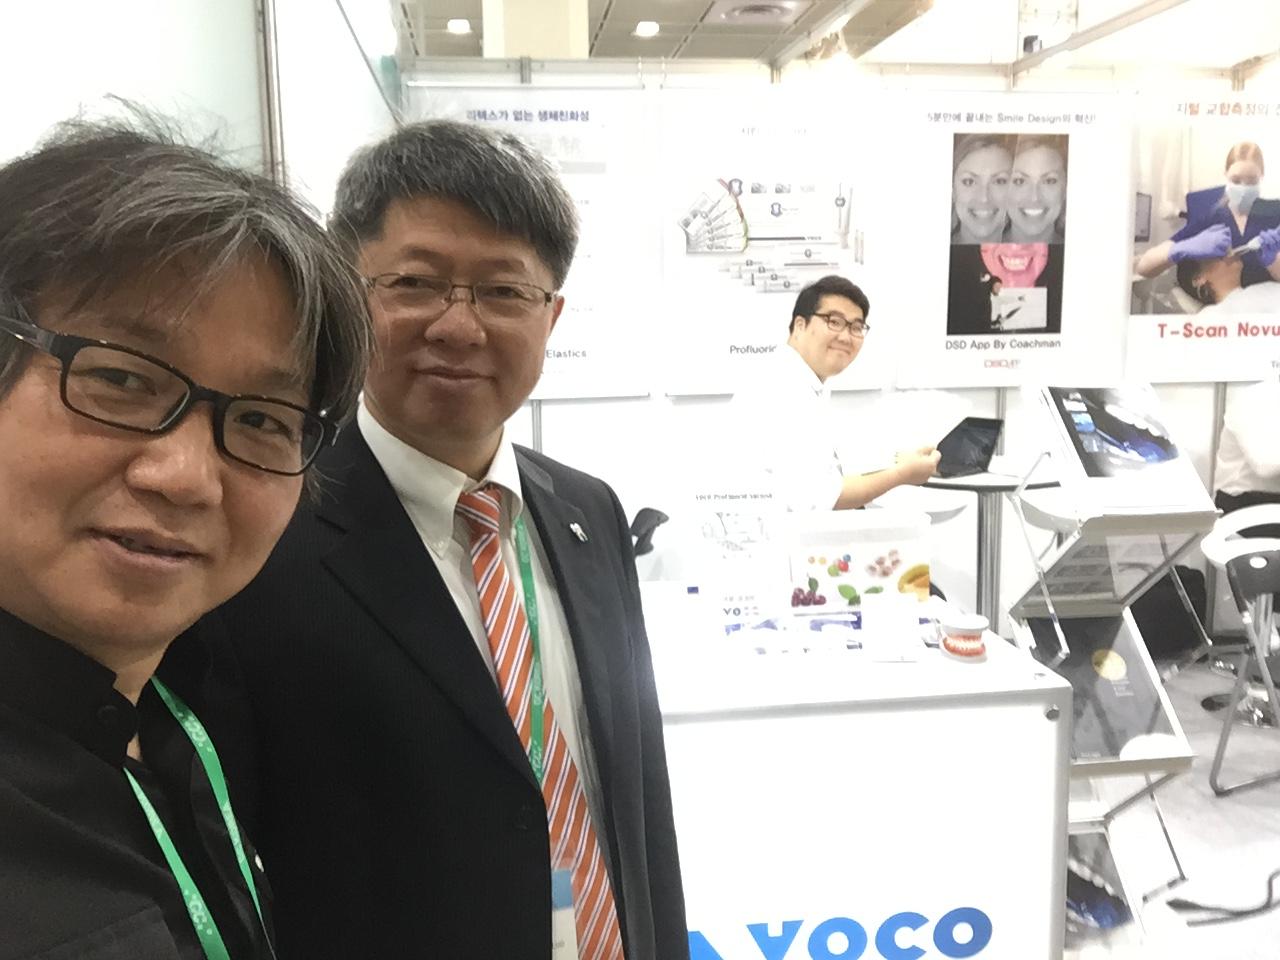 VOCO沃柯东亚区域经理骆博士(右)与VOCO沃柯韩国的特约经销商Yours Dental Co.,Ltd.负责人,一同参与了展会